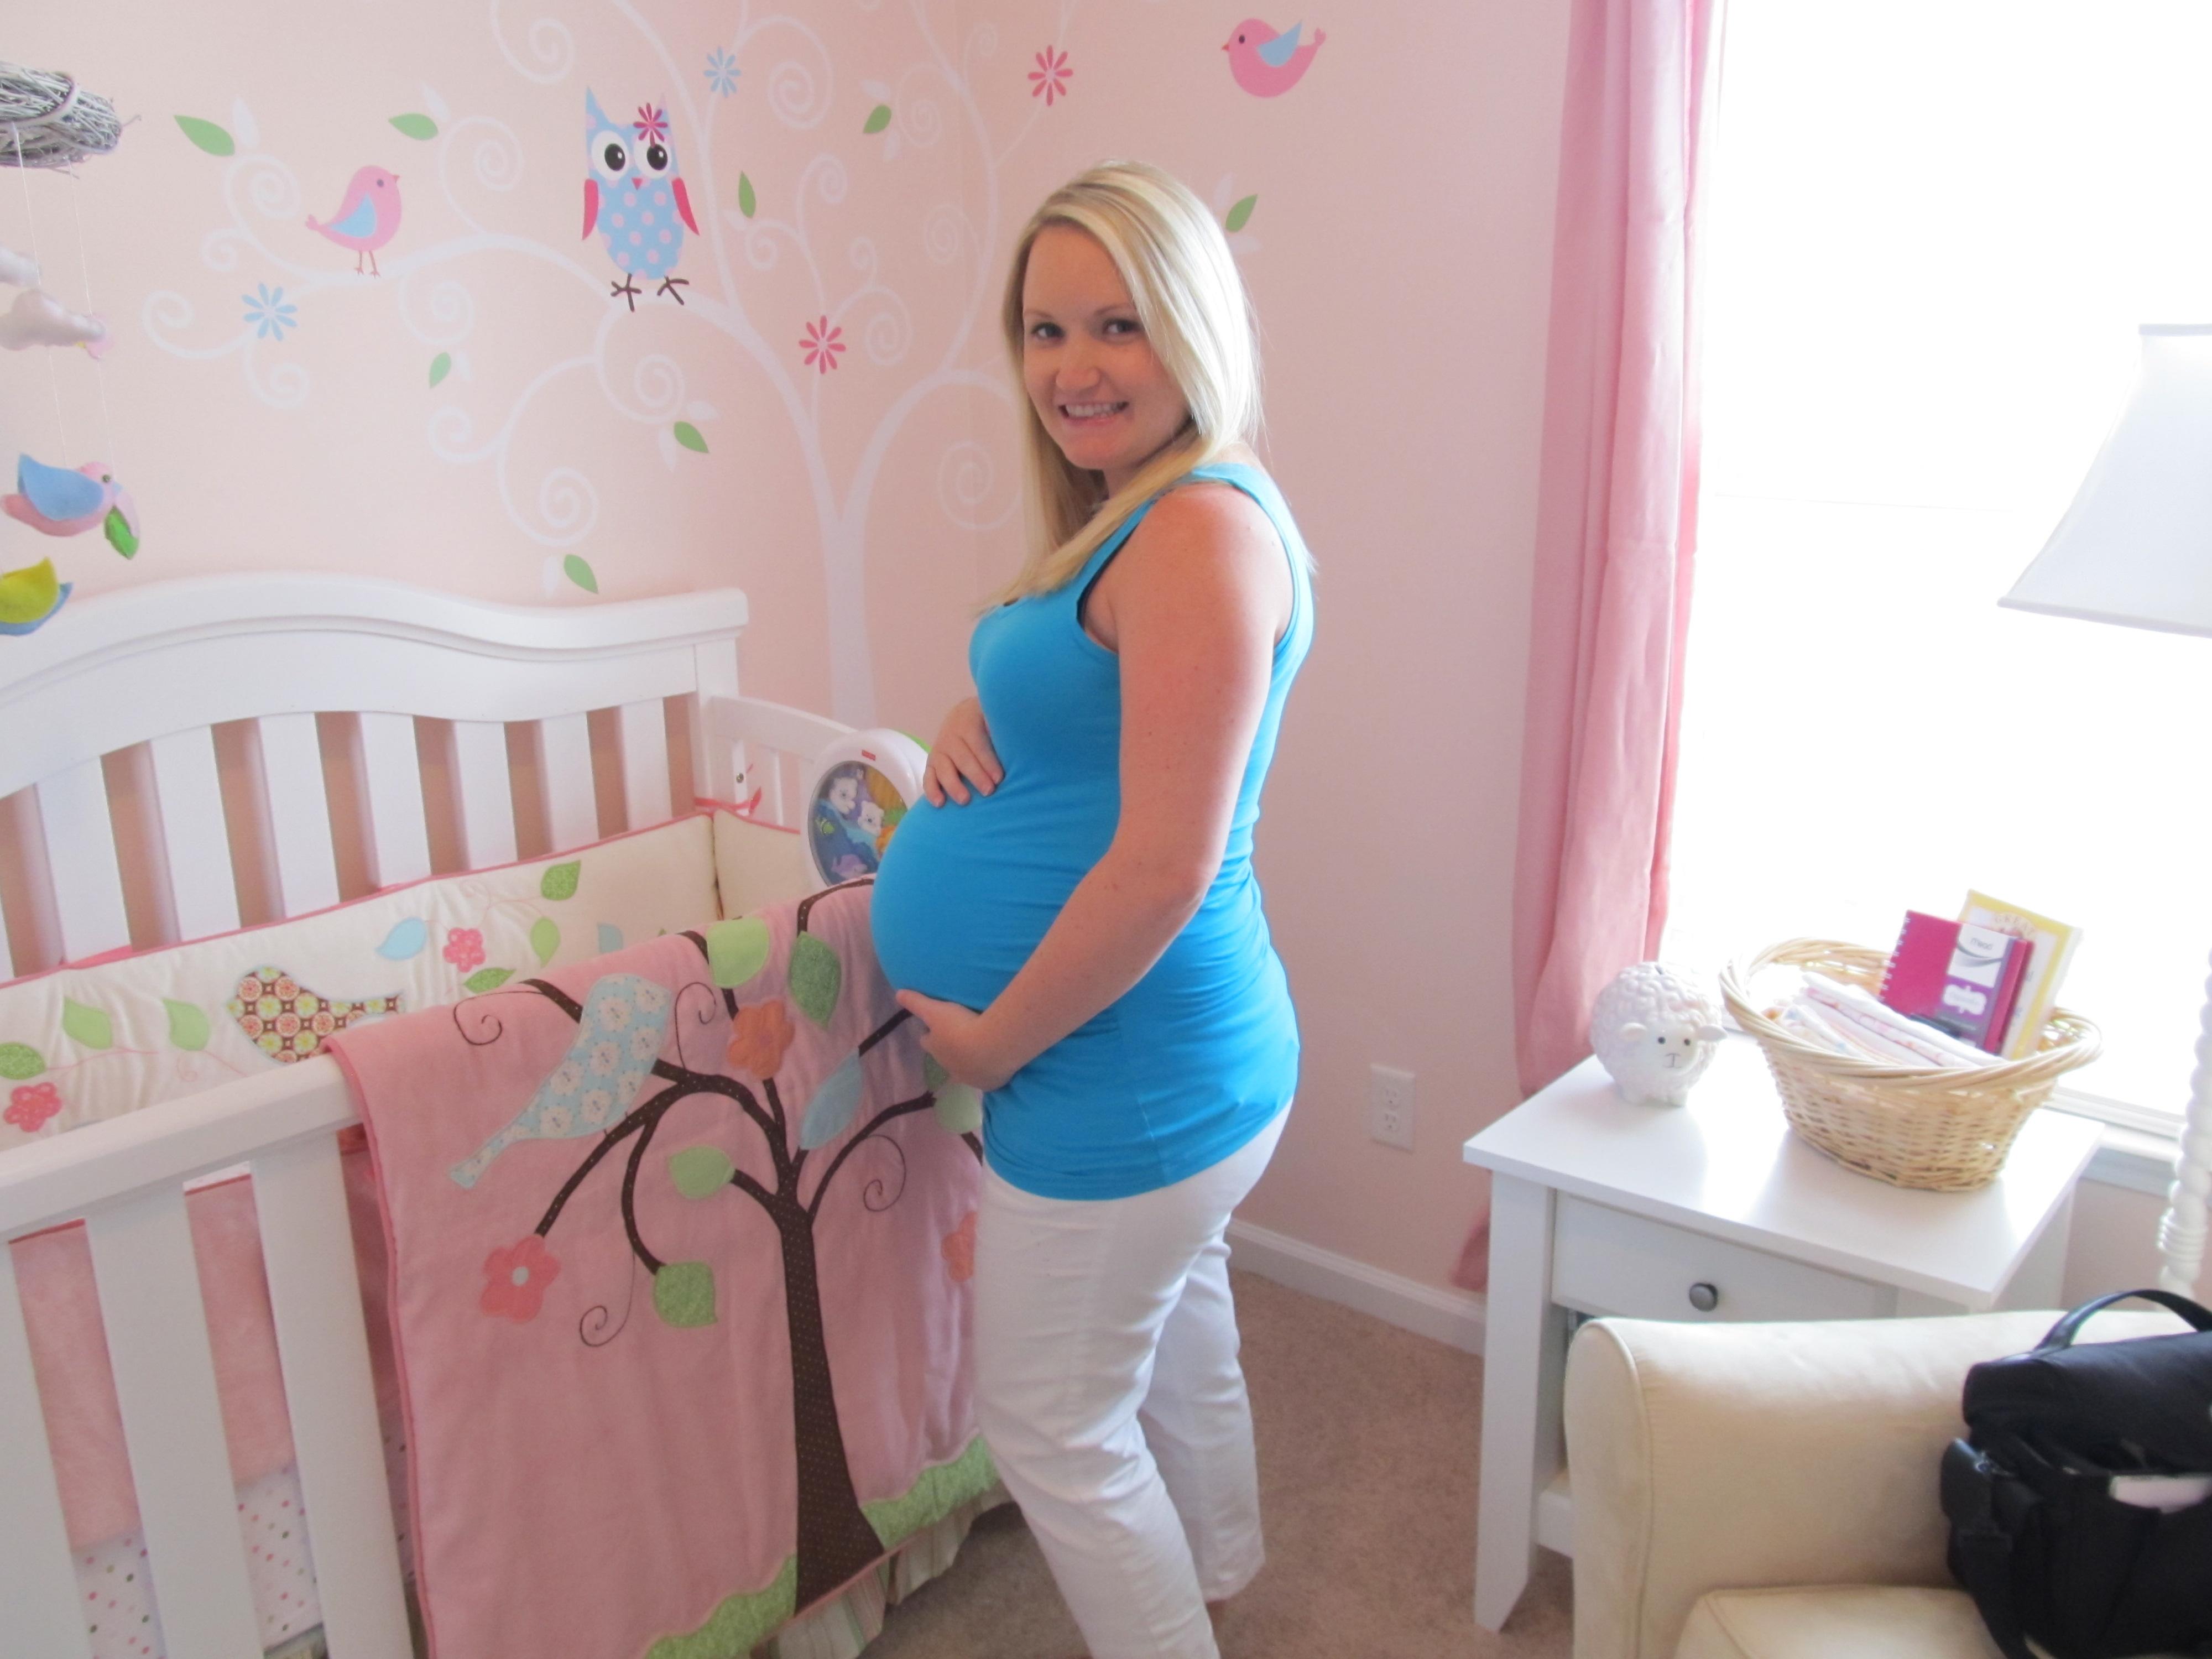 Sadie's Nursery - Project Nursery